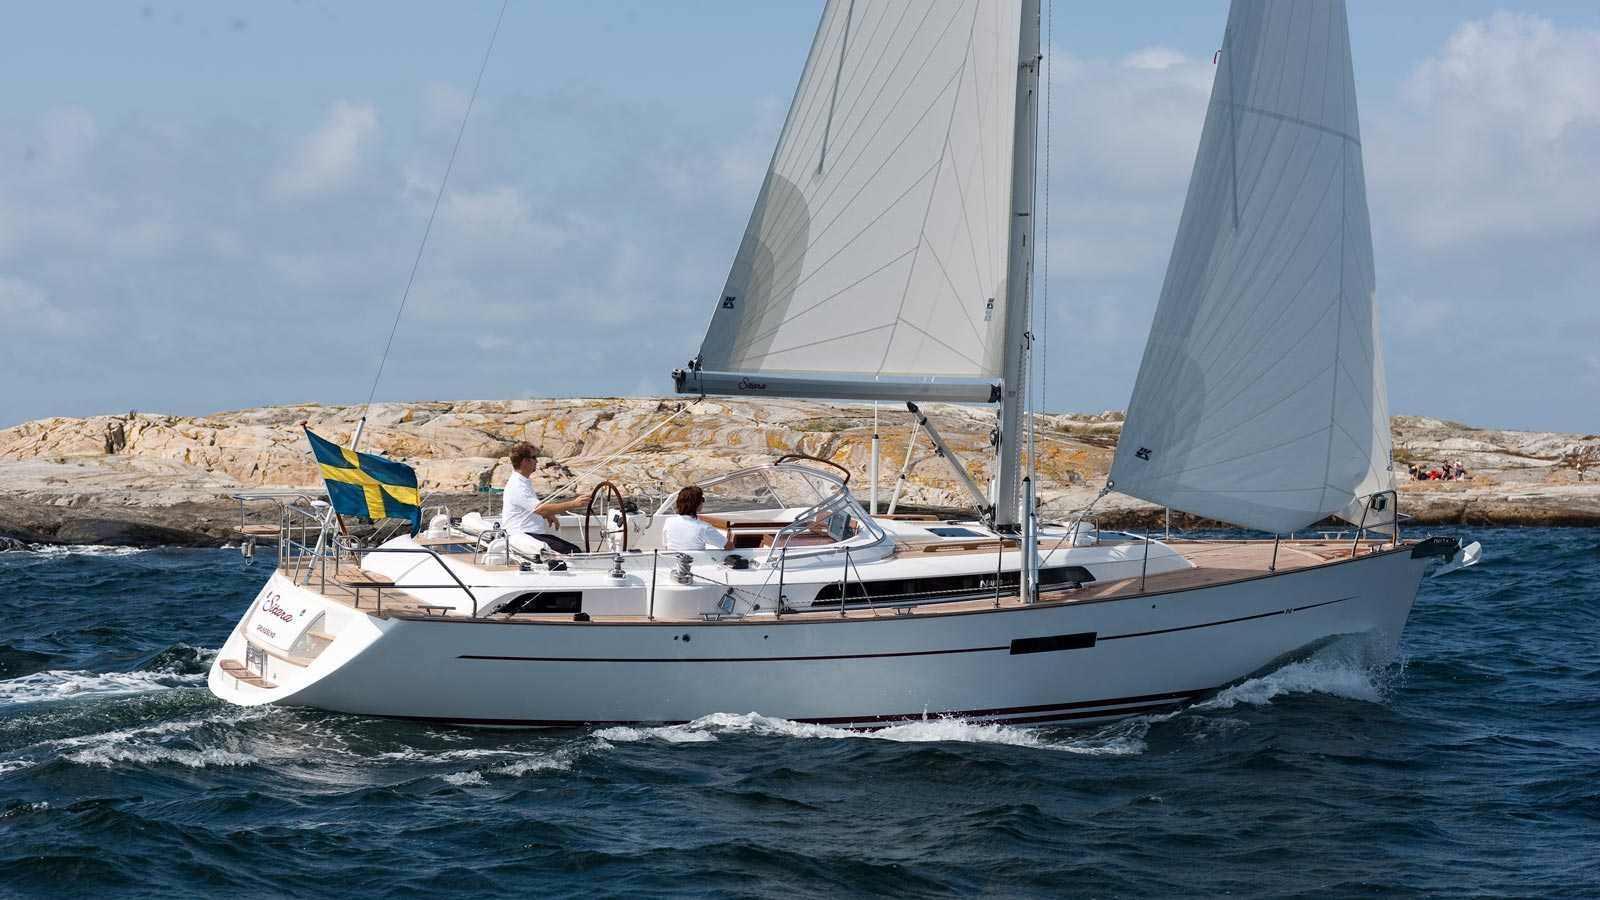 Click image for larger version  Name:cruising-sailboat-center-cockpit-teak-deck-20232-4423677.jpg Views:641 Size:124.8 KB ID:92969